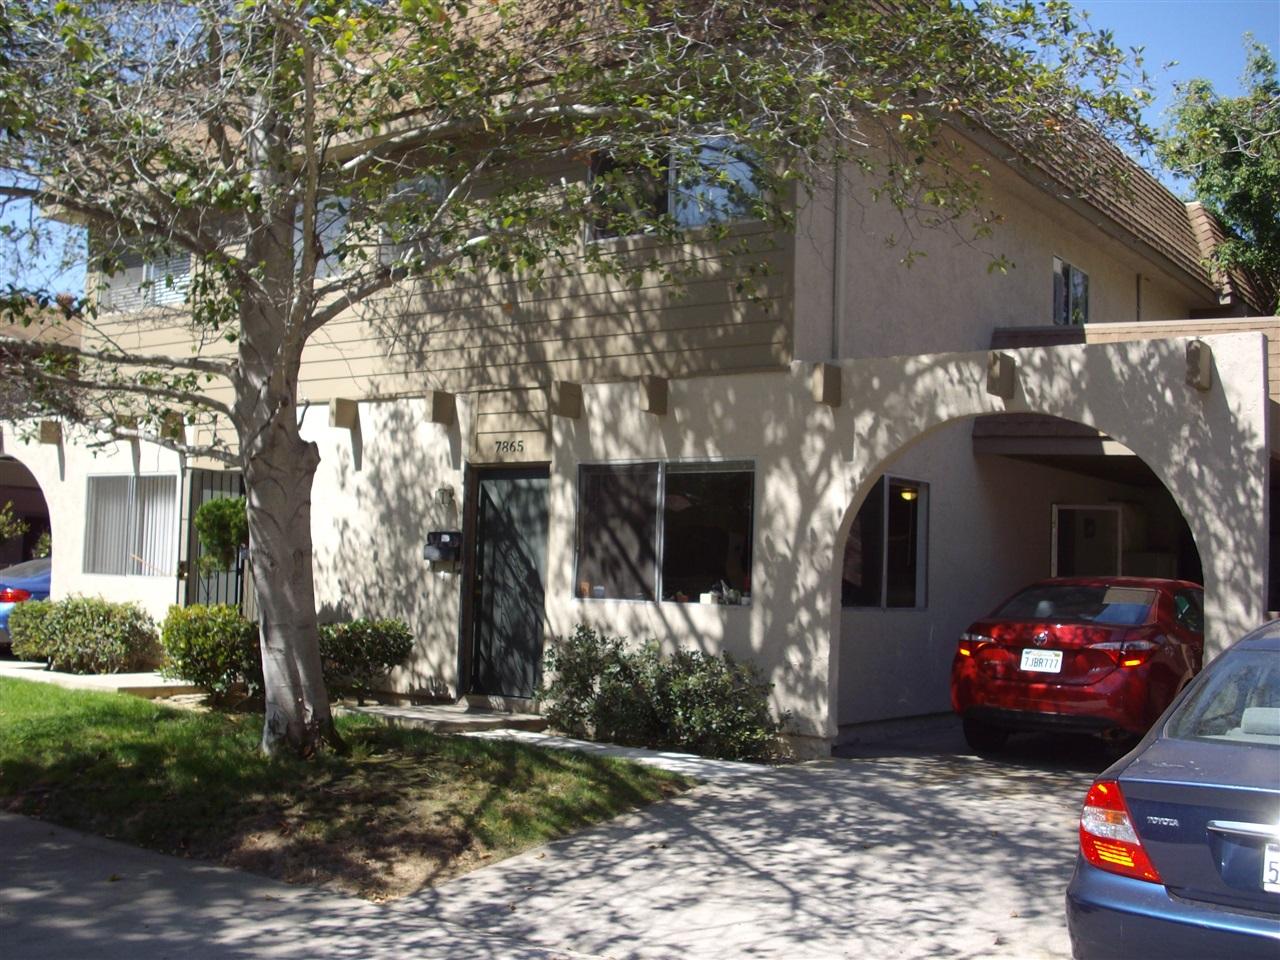 7865 Camino Augila, San Diego, CA 92122